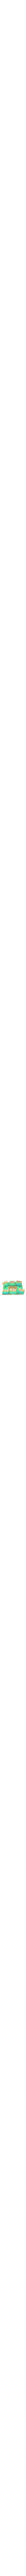 Ceramic turquoise Passover Plate